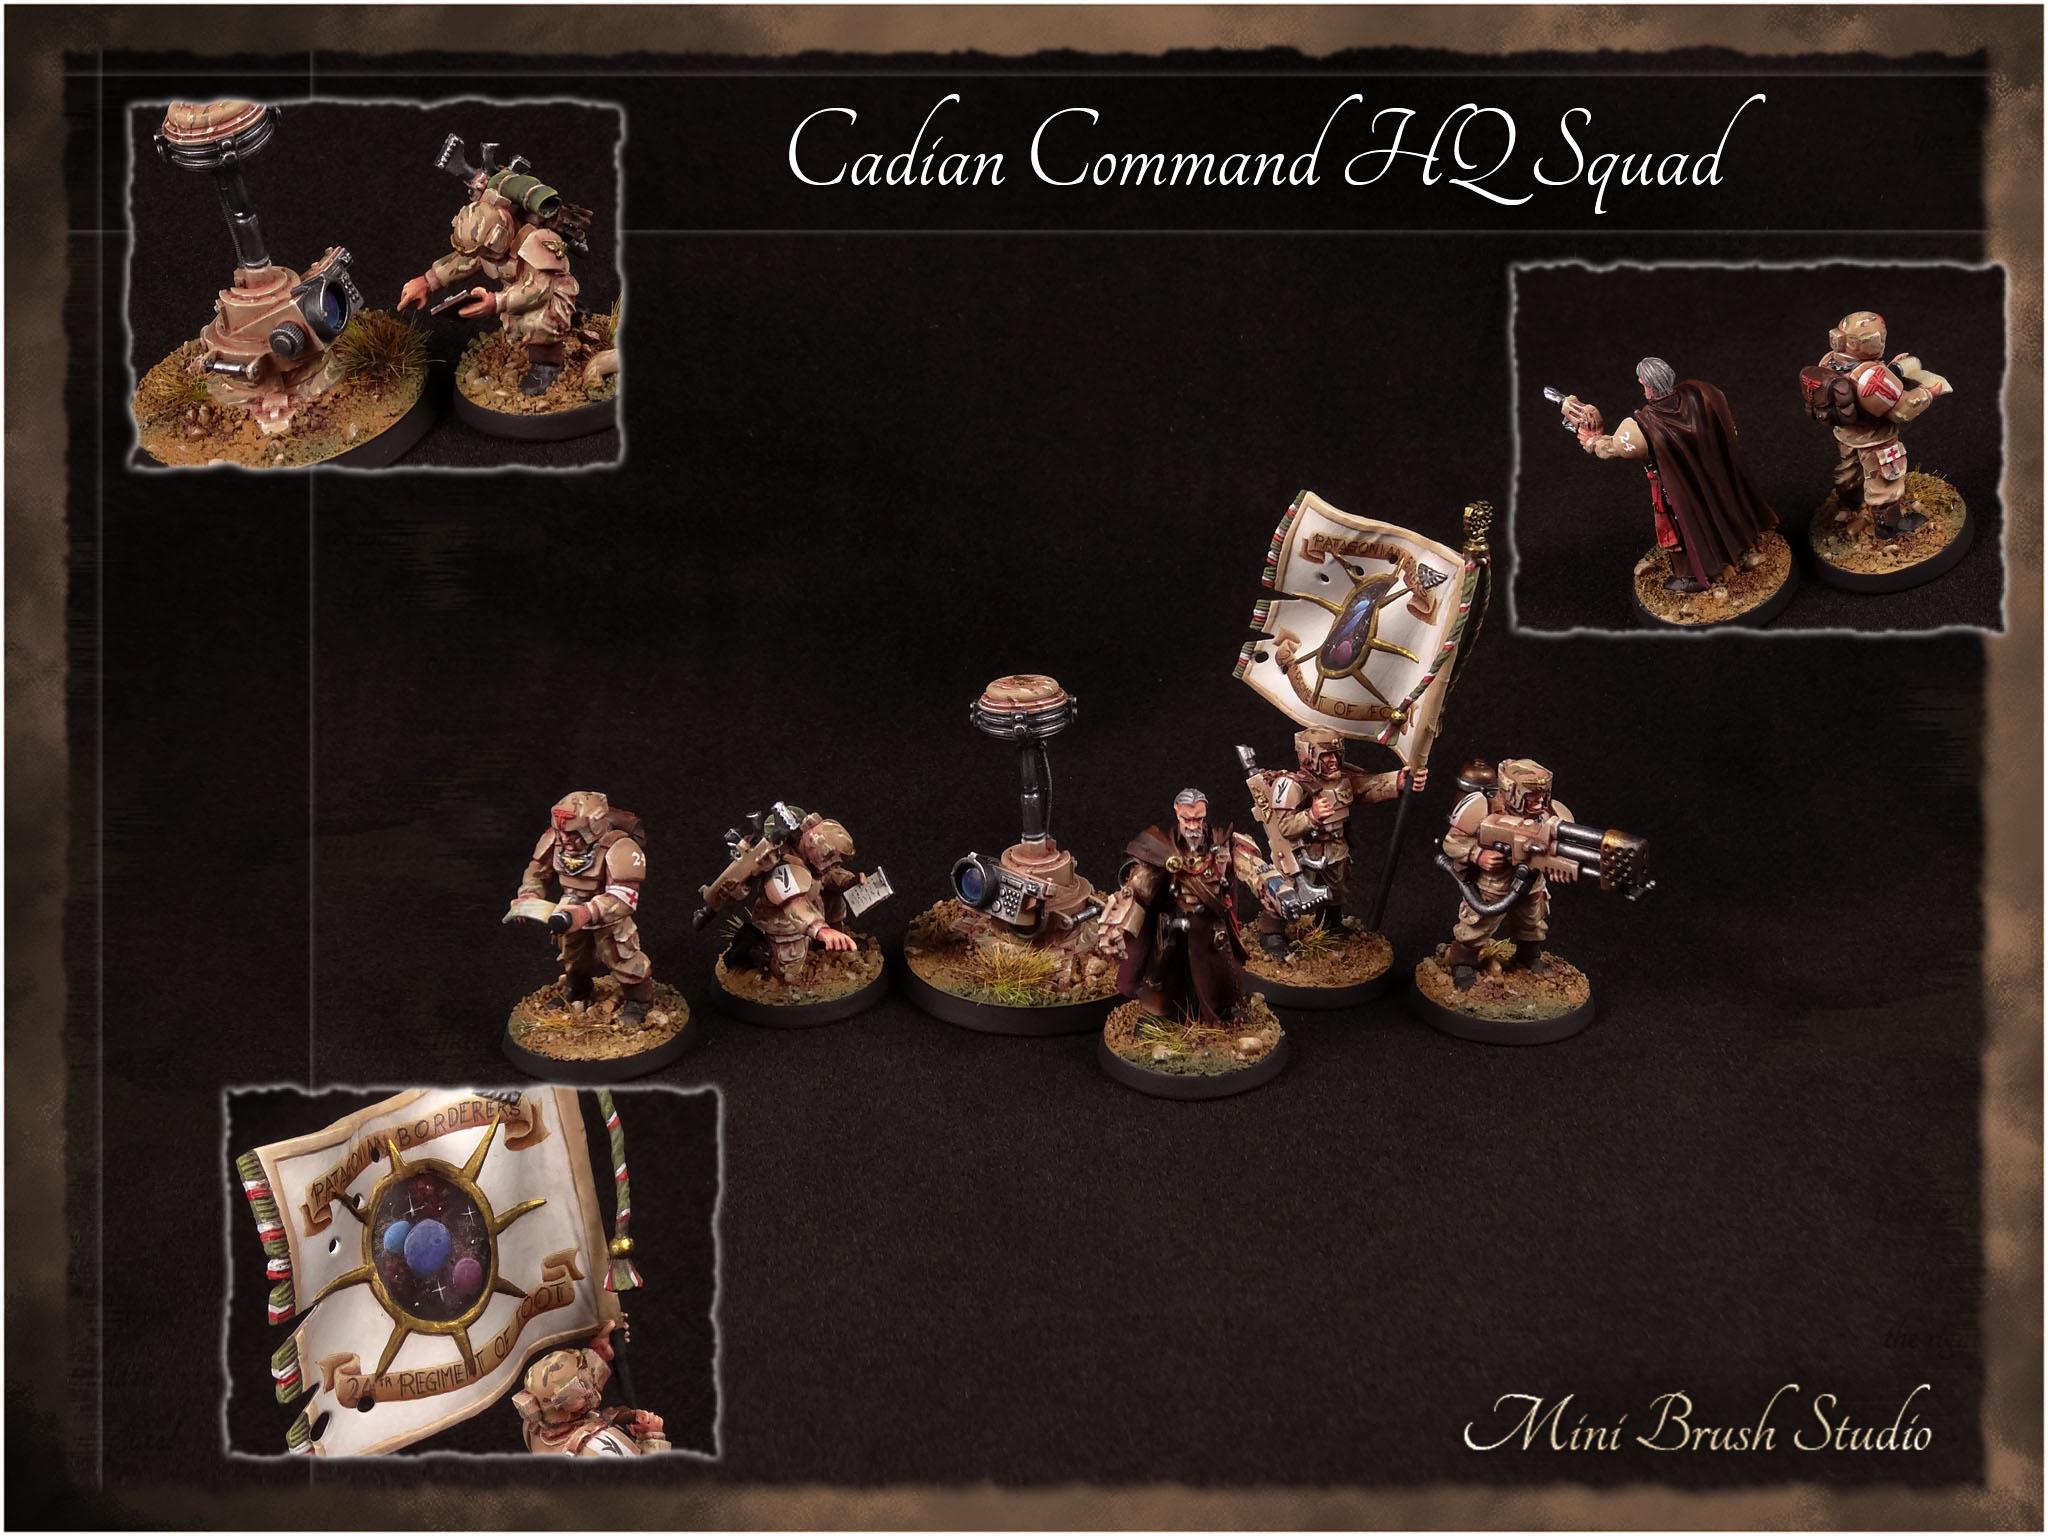 Cadian Command HQ Squad 1 v7.00.jpg